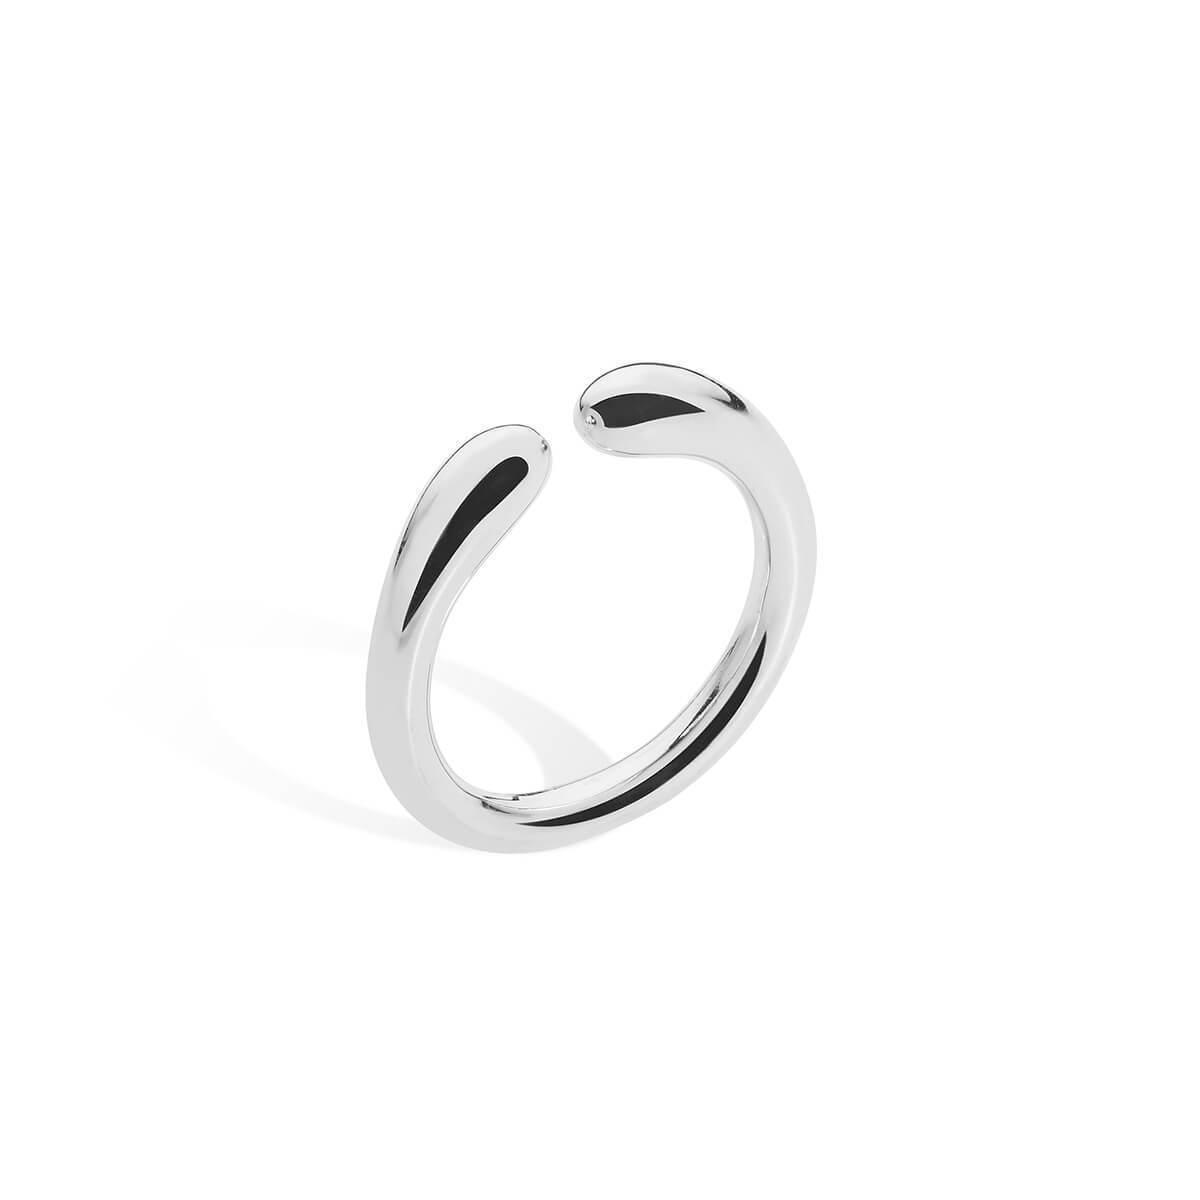 Lucy Quartermaine Curve Midi Ring - UK G - US 3 3/8 - EU 45 1/4 iaHxtnOtFI